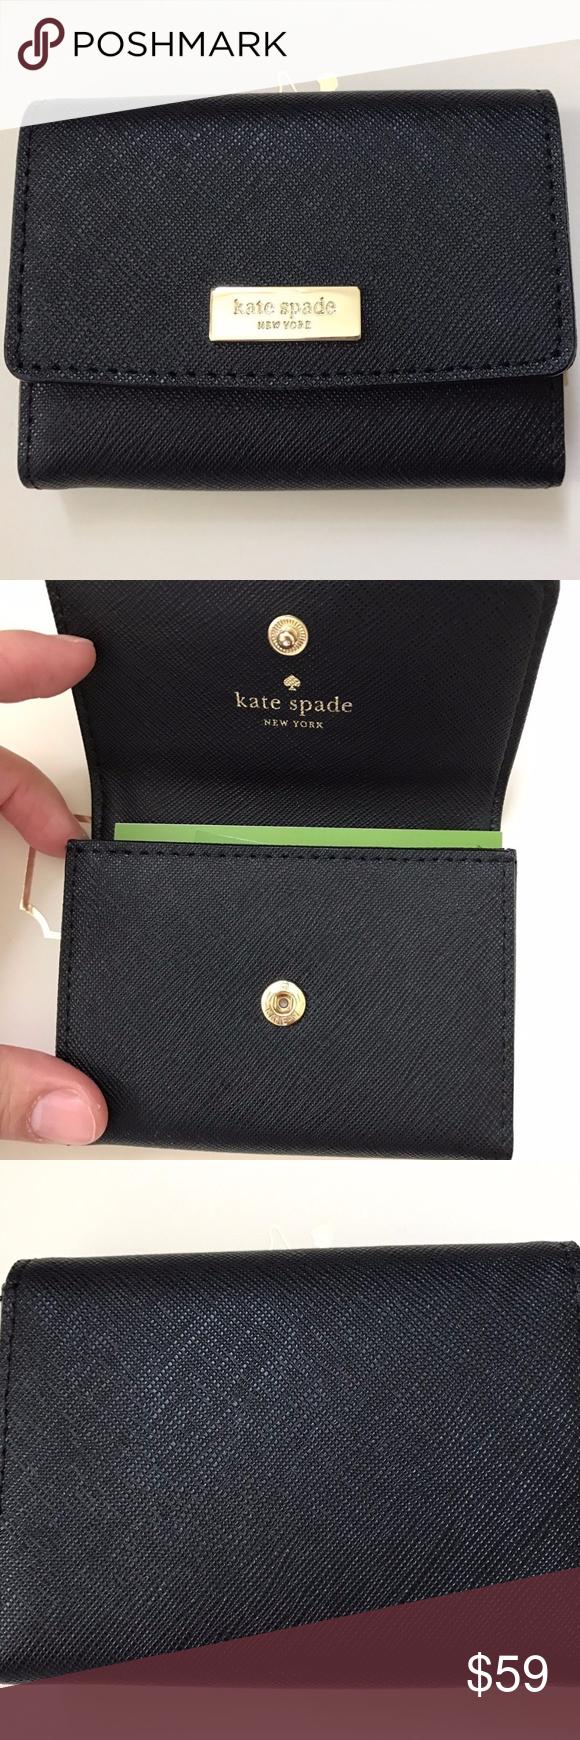 Kate Spade Large Holly Credit Card Case Holder Credit Card Cases Kate Spade Clothes Design